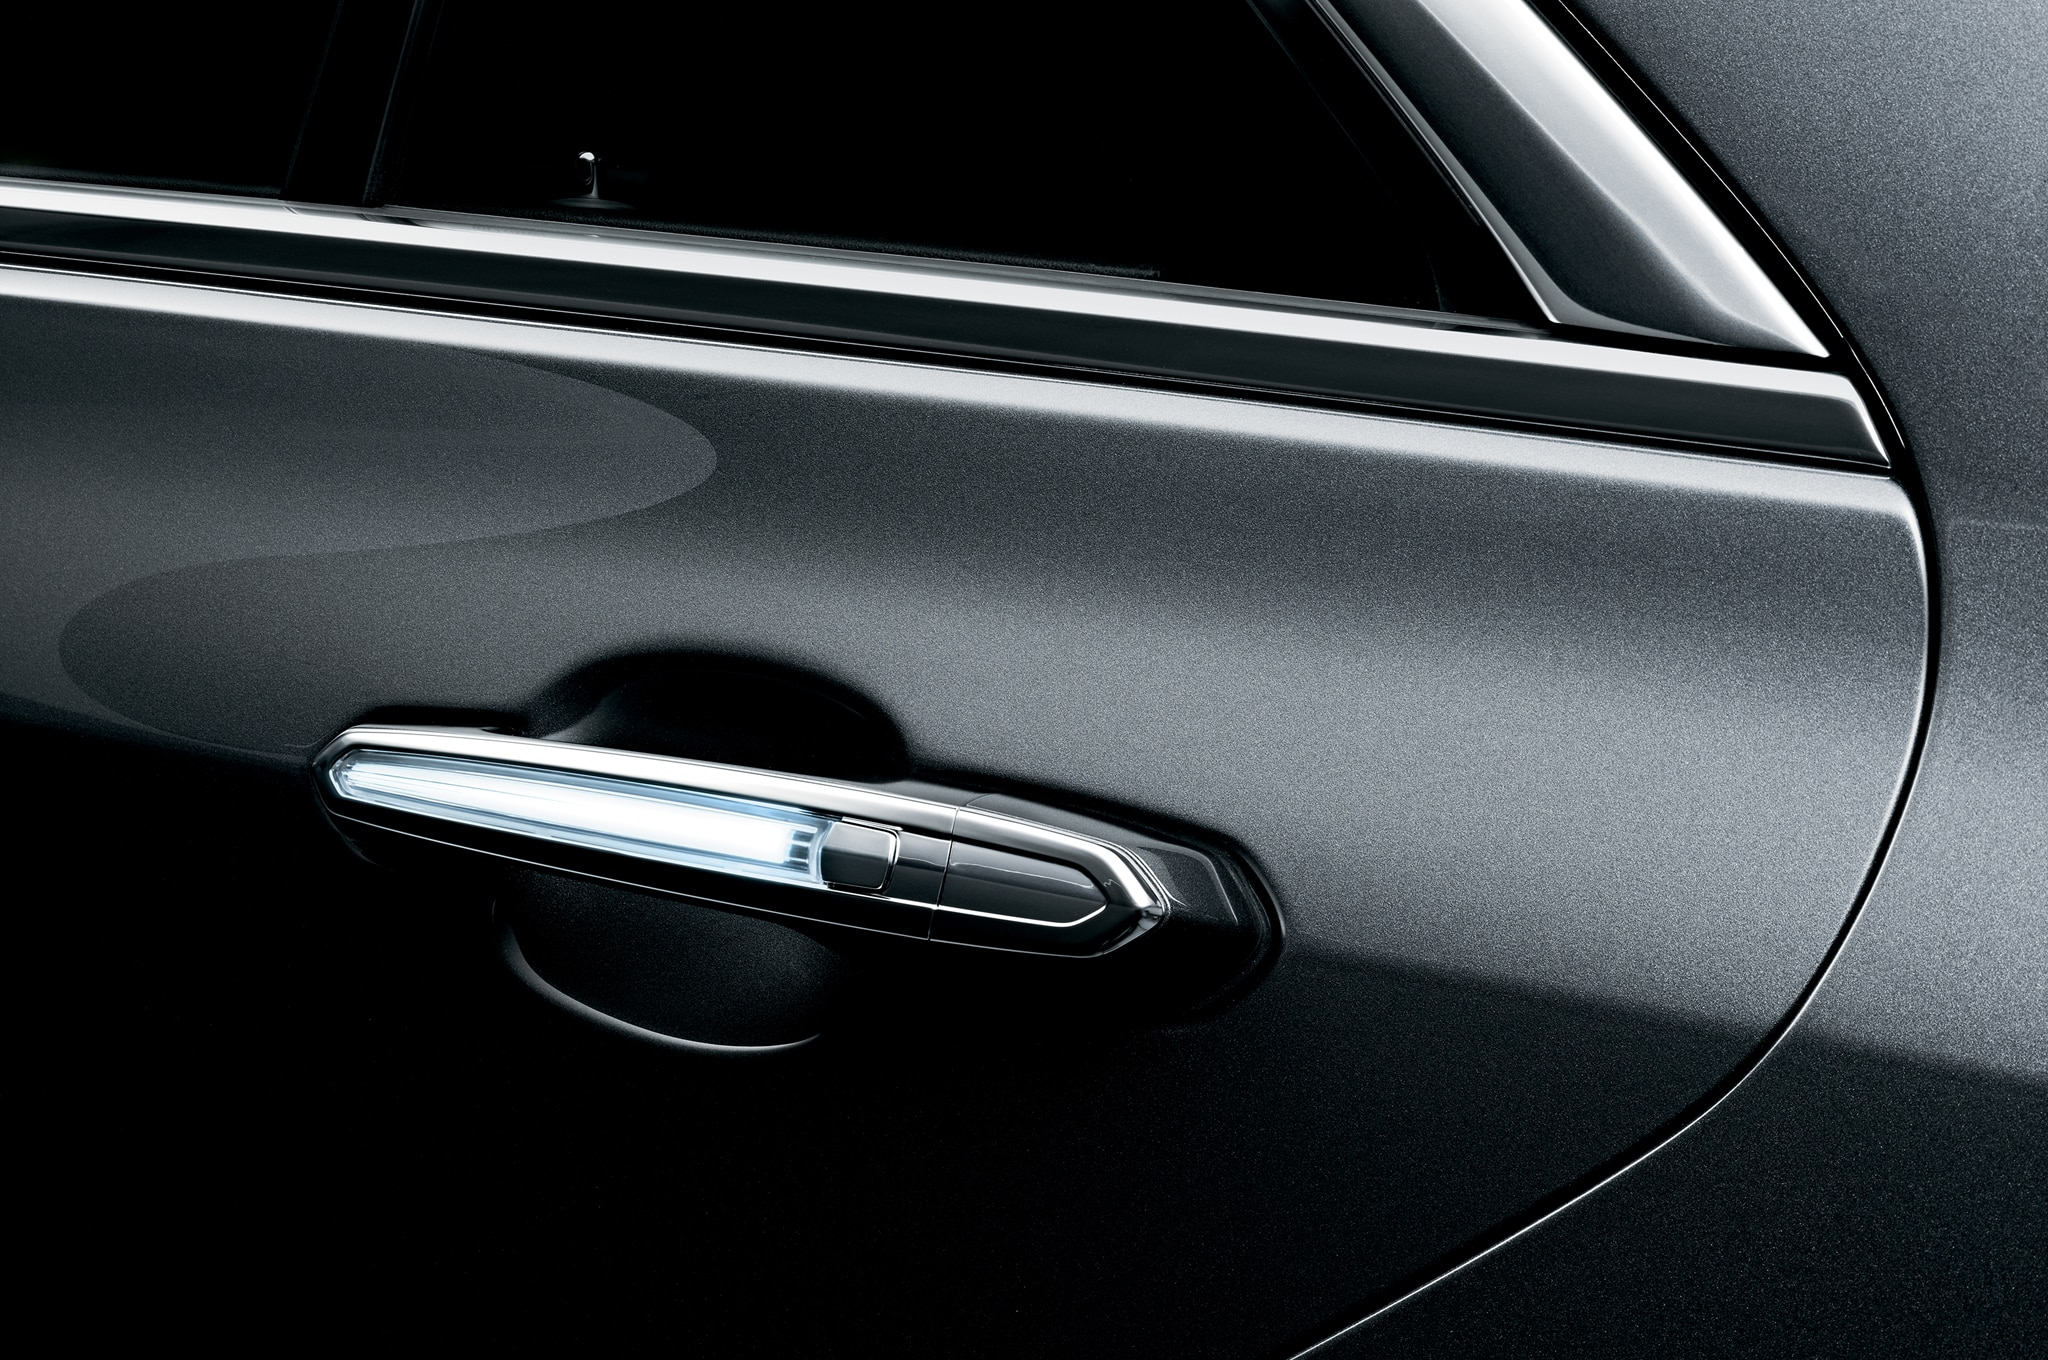 2015 Cadillac Ats Sedan Gains New Badge Tech Features